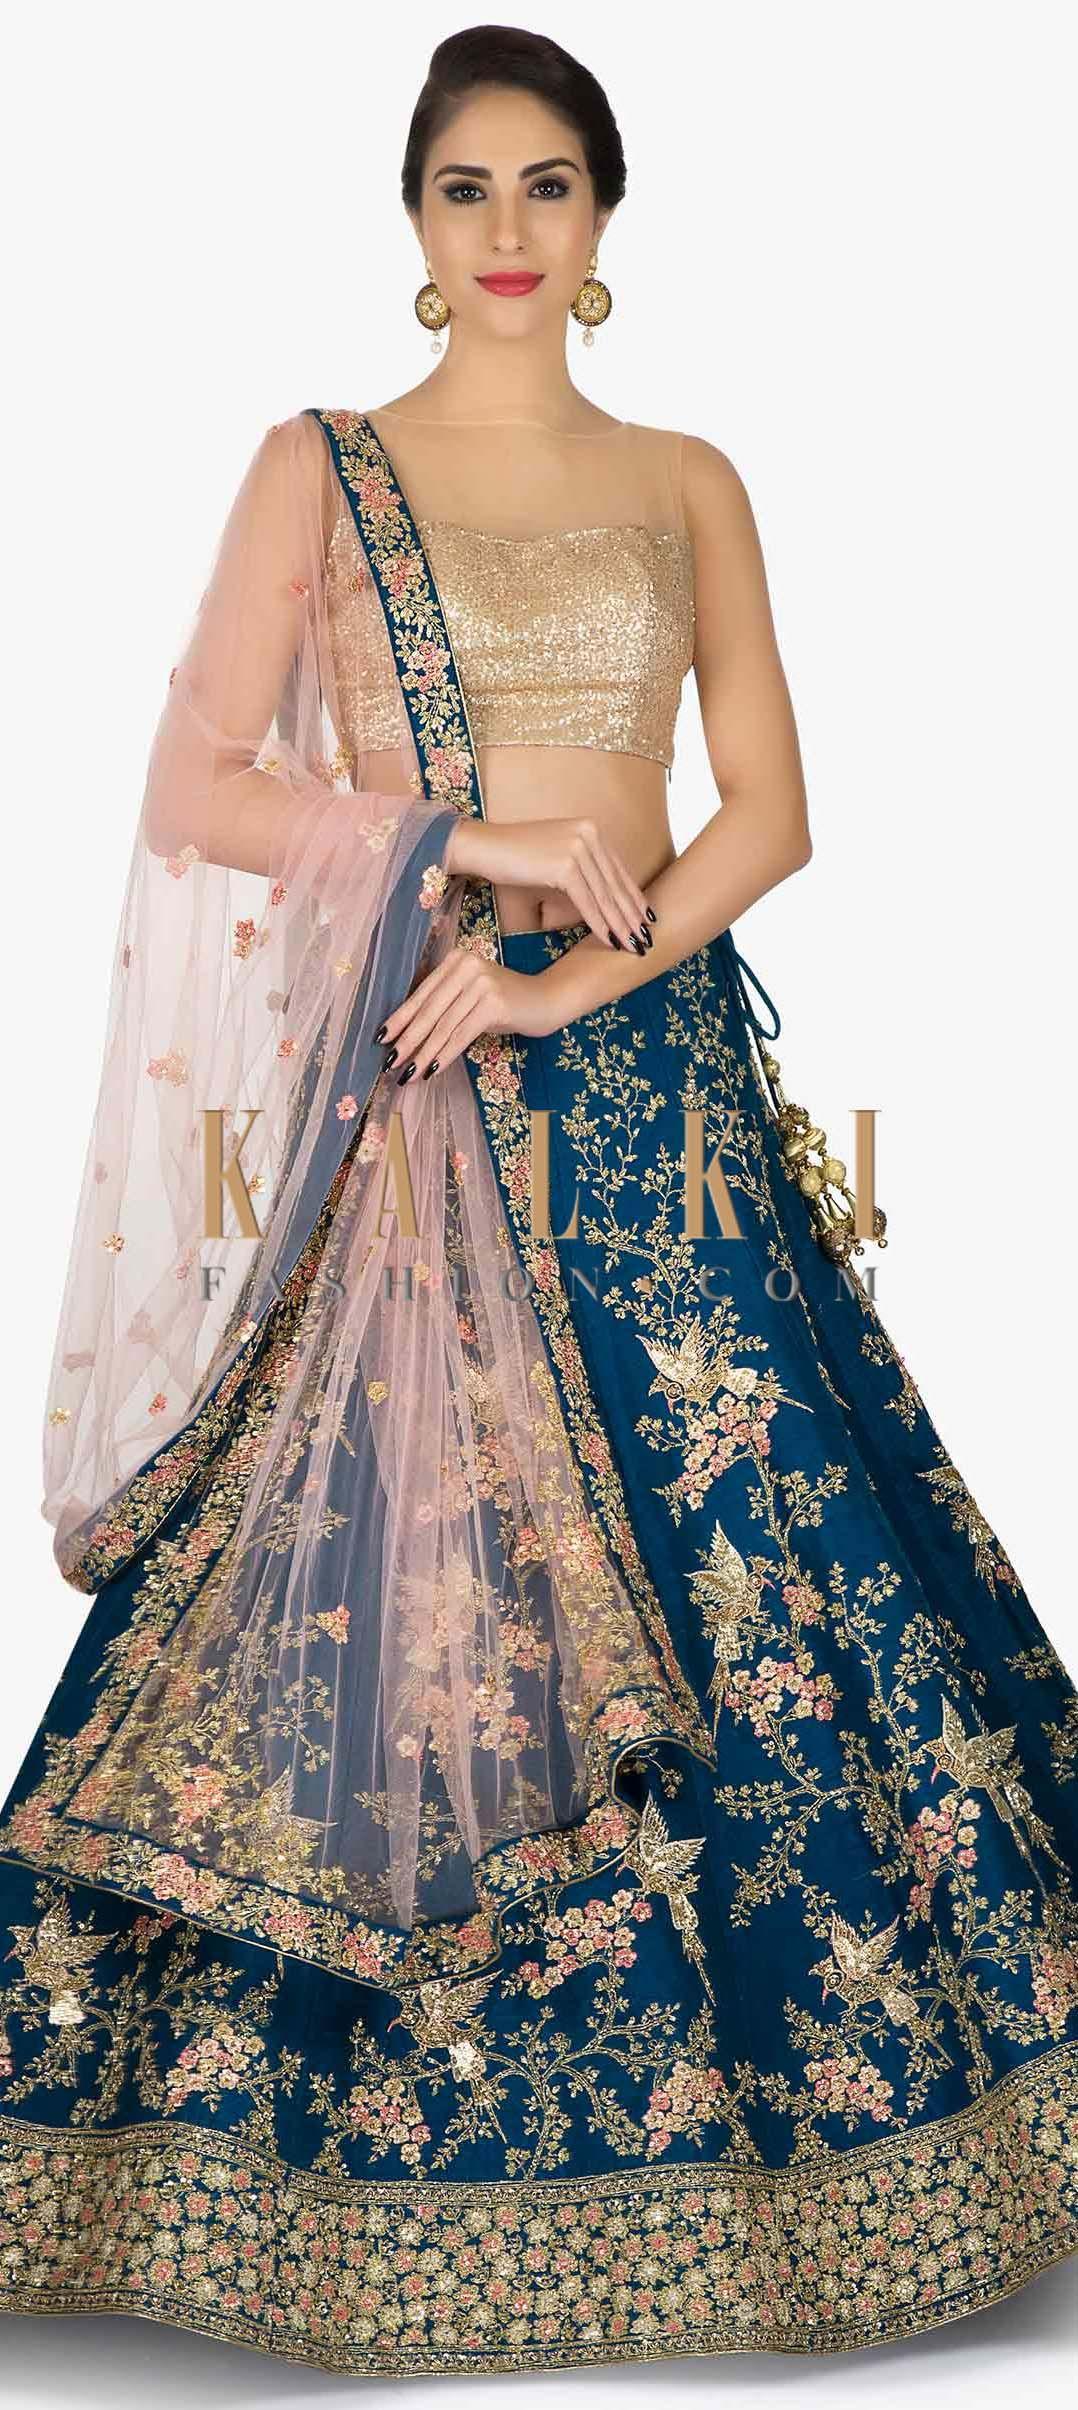 Teal Blue Lehenga Embellished In Bird Motifs With Pink Net Dupatta Only On Kalki Designer Bridal Lehenga Blue Lehenga Designer Dresses Indian